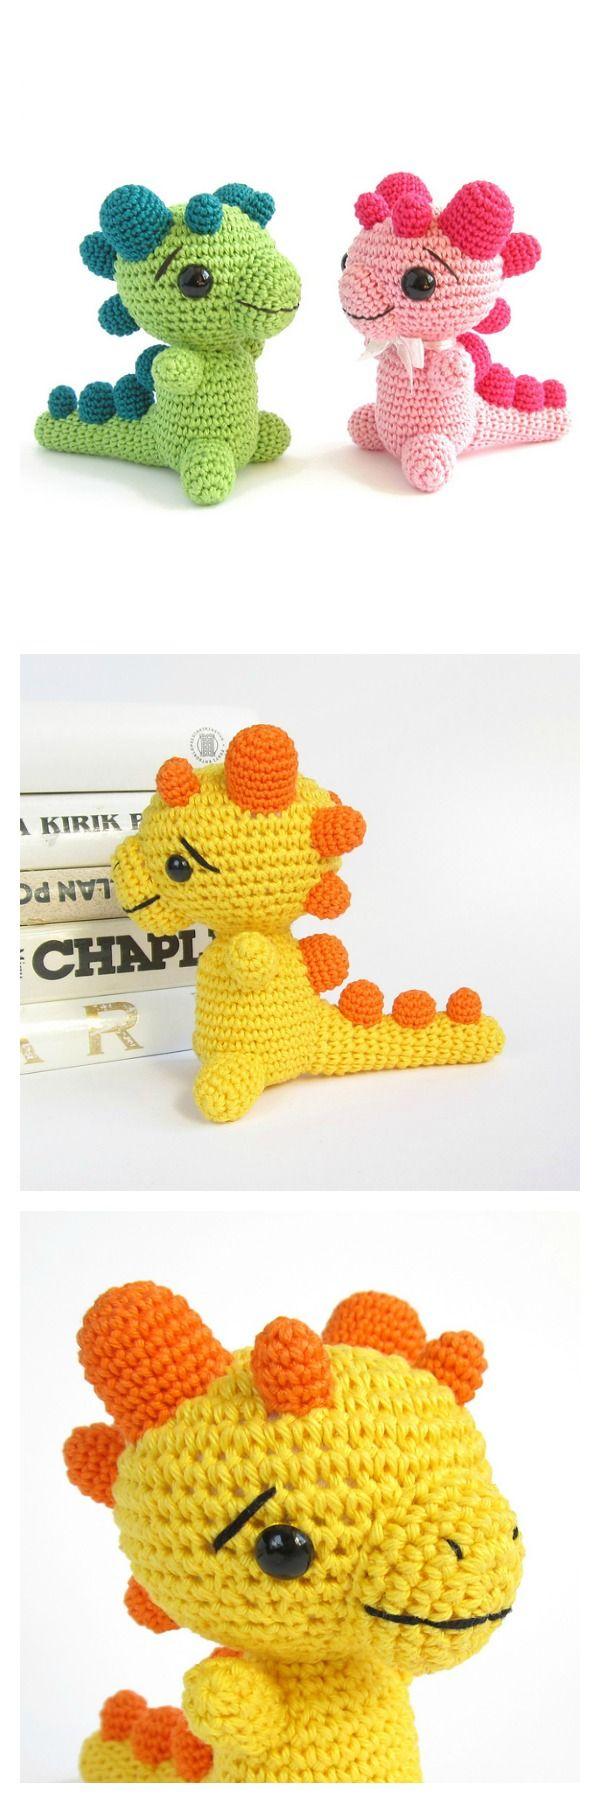 Crochet Amigurumi Rattle Baby Dragon Dinosaur Free Pattern